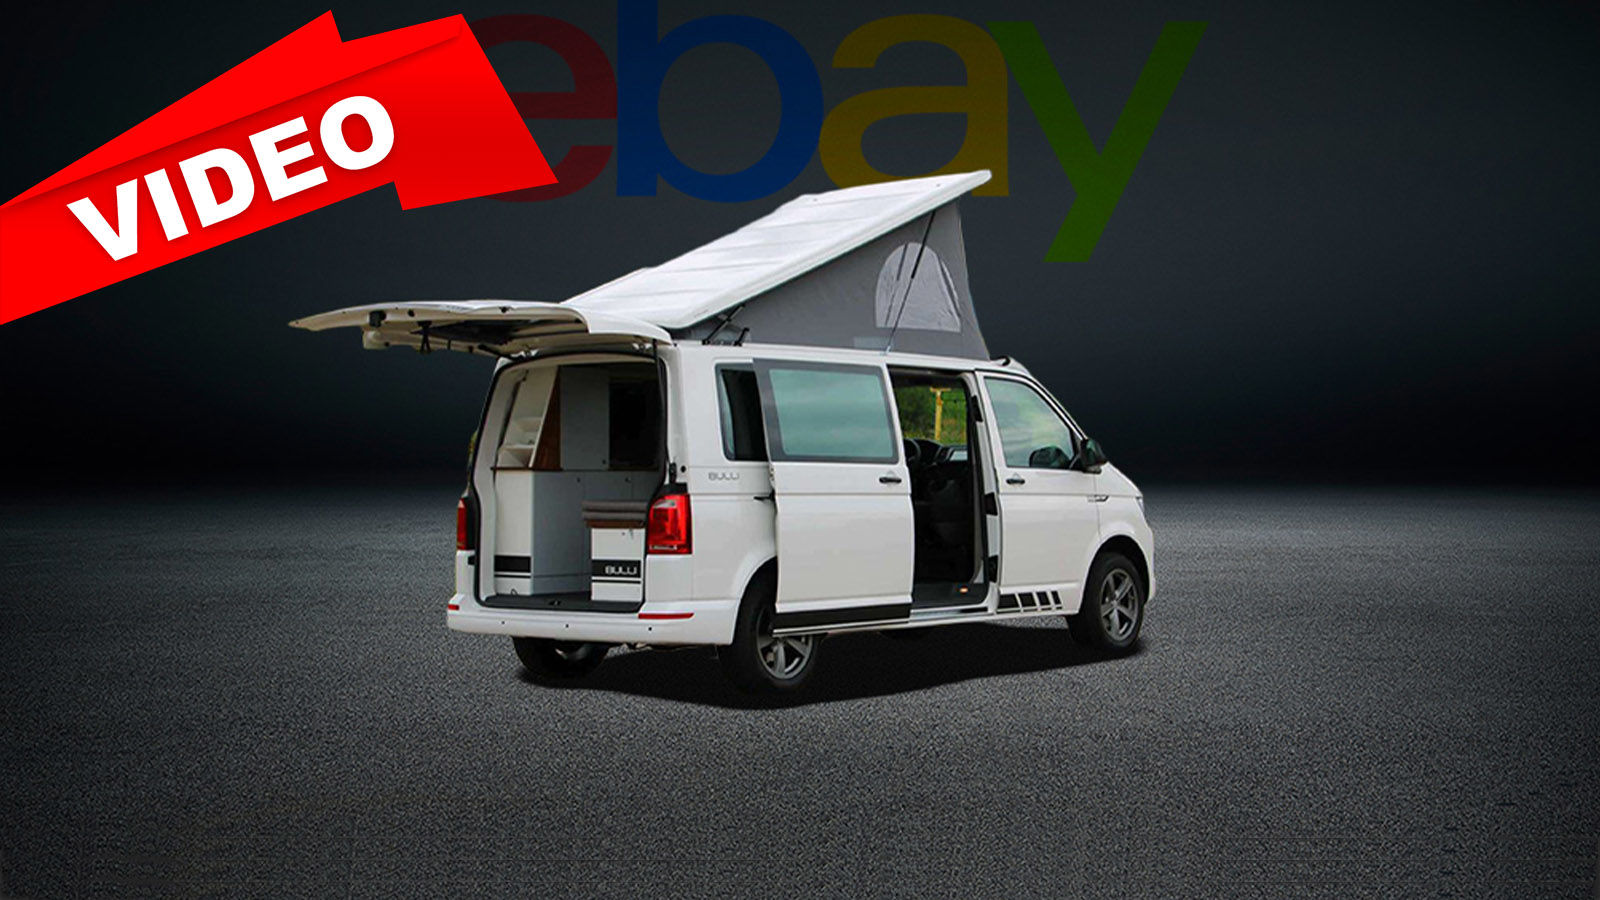 VW T6 2.0 TDI Camper (2017): eBay - Bulli - California ...